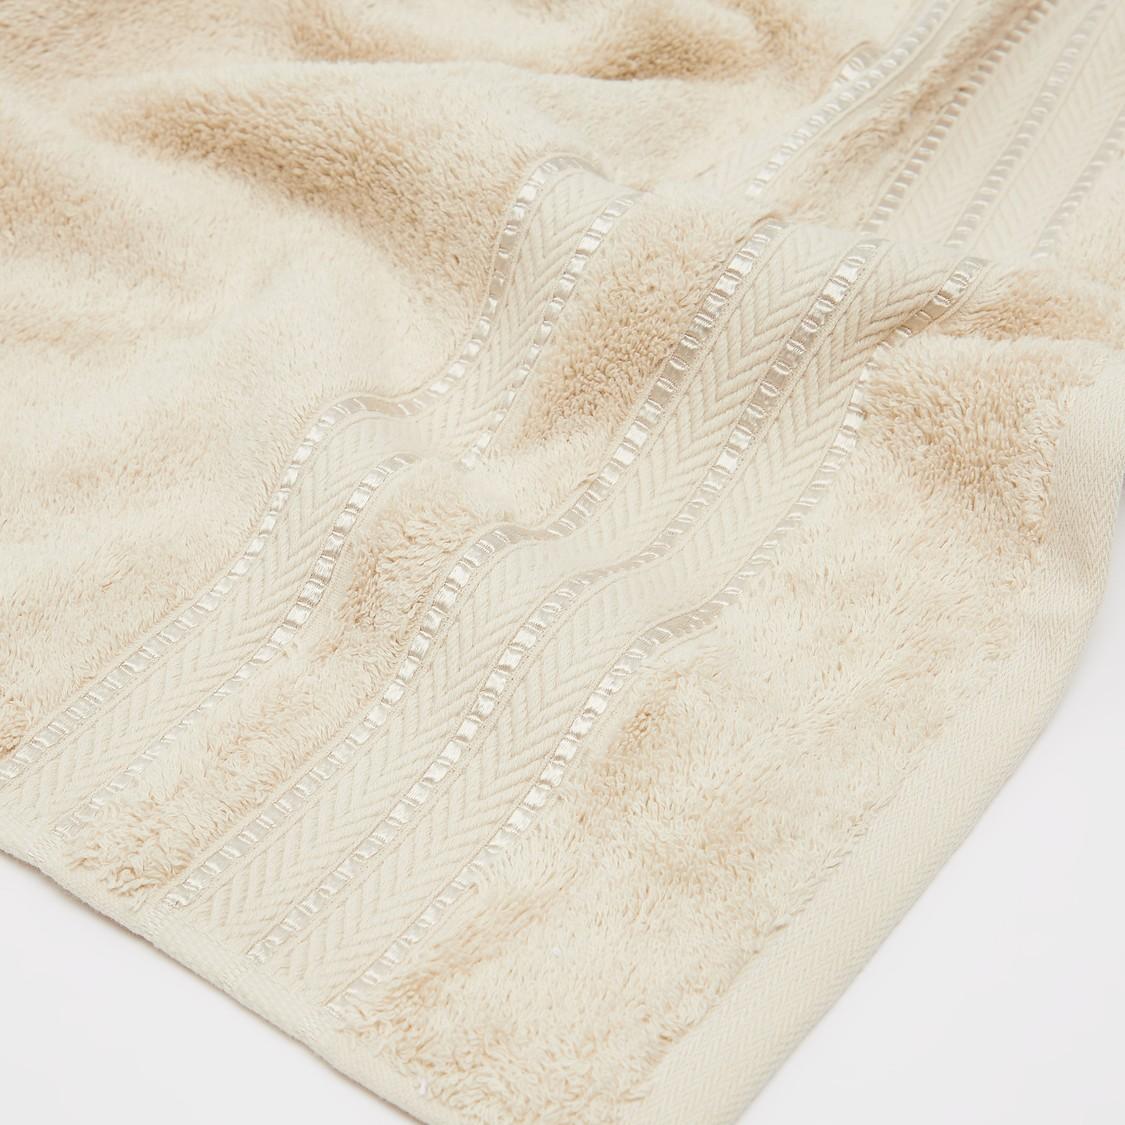 Textured Egyptian Cotton Bath Towel - 140x70 cms